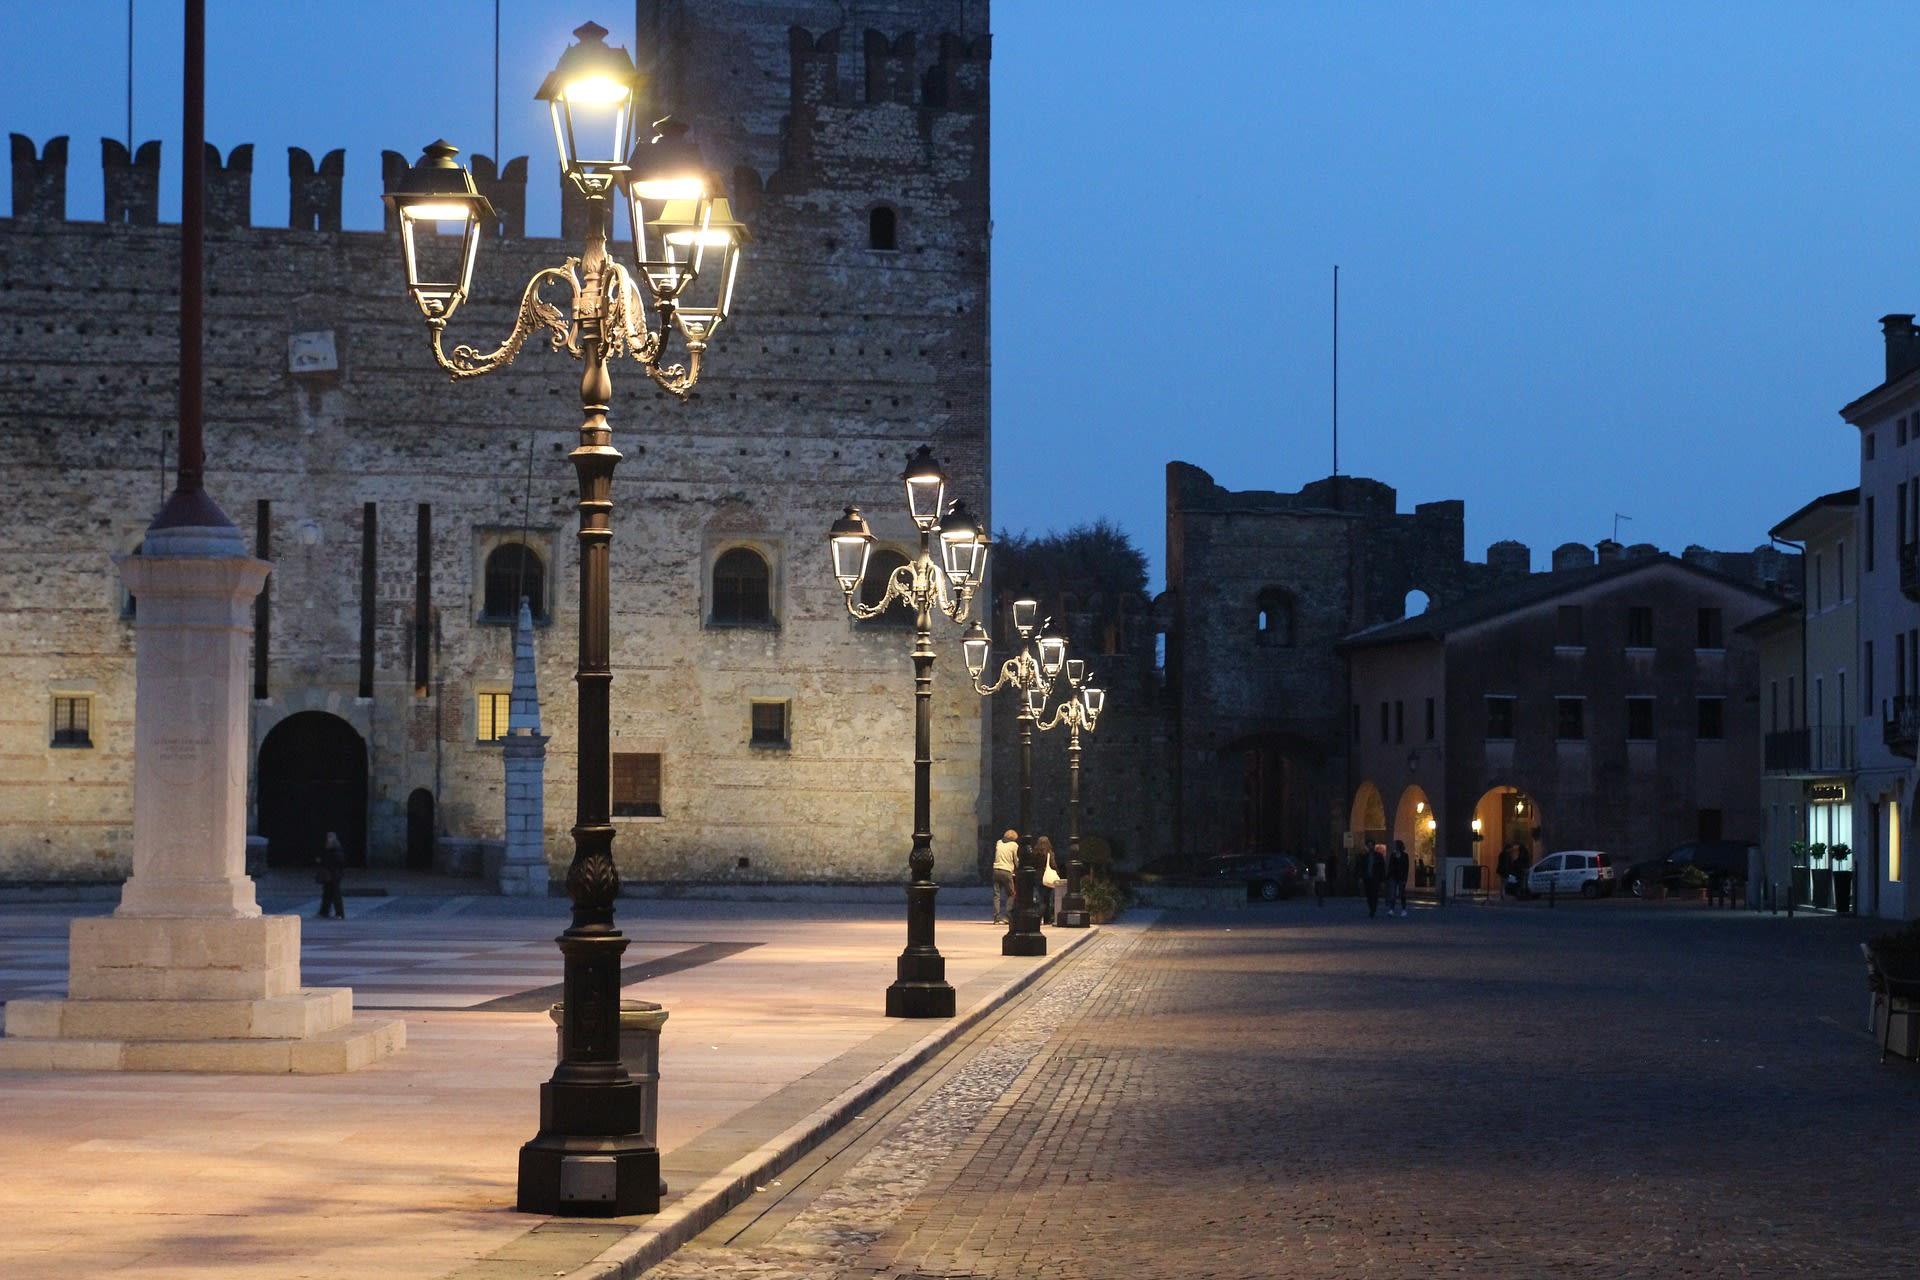 Veneto - Marostica - the Human Chess Game city